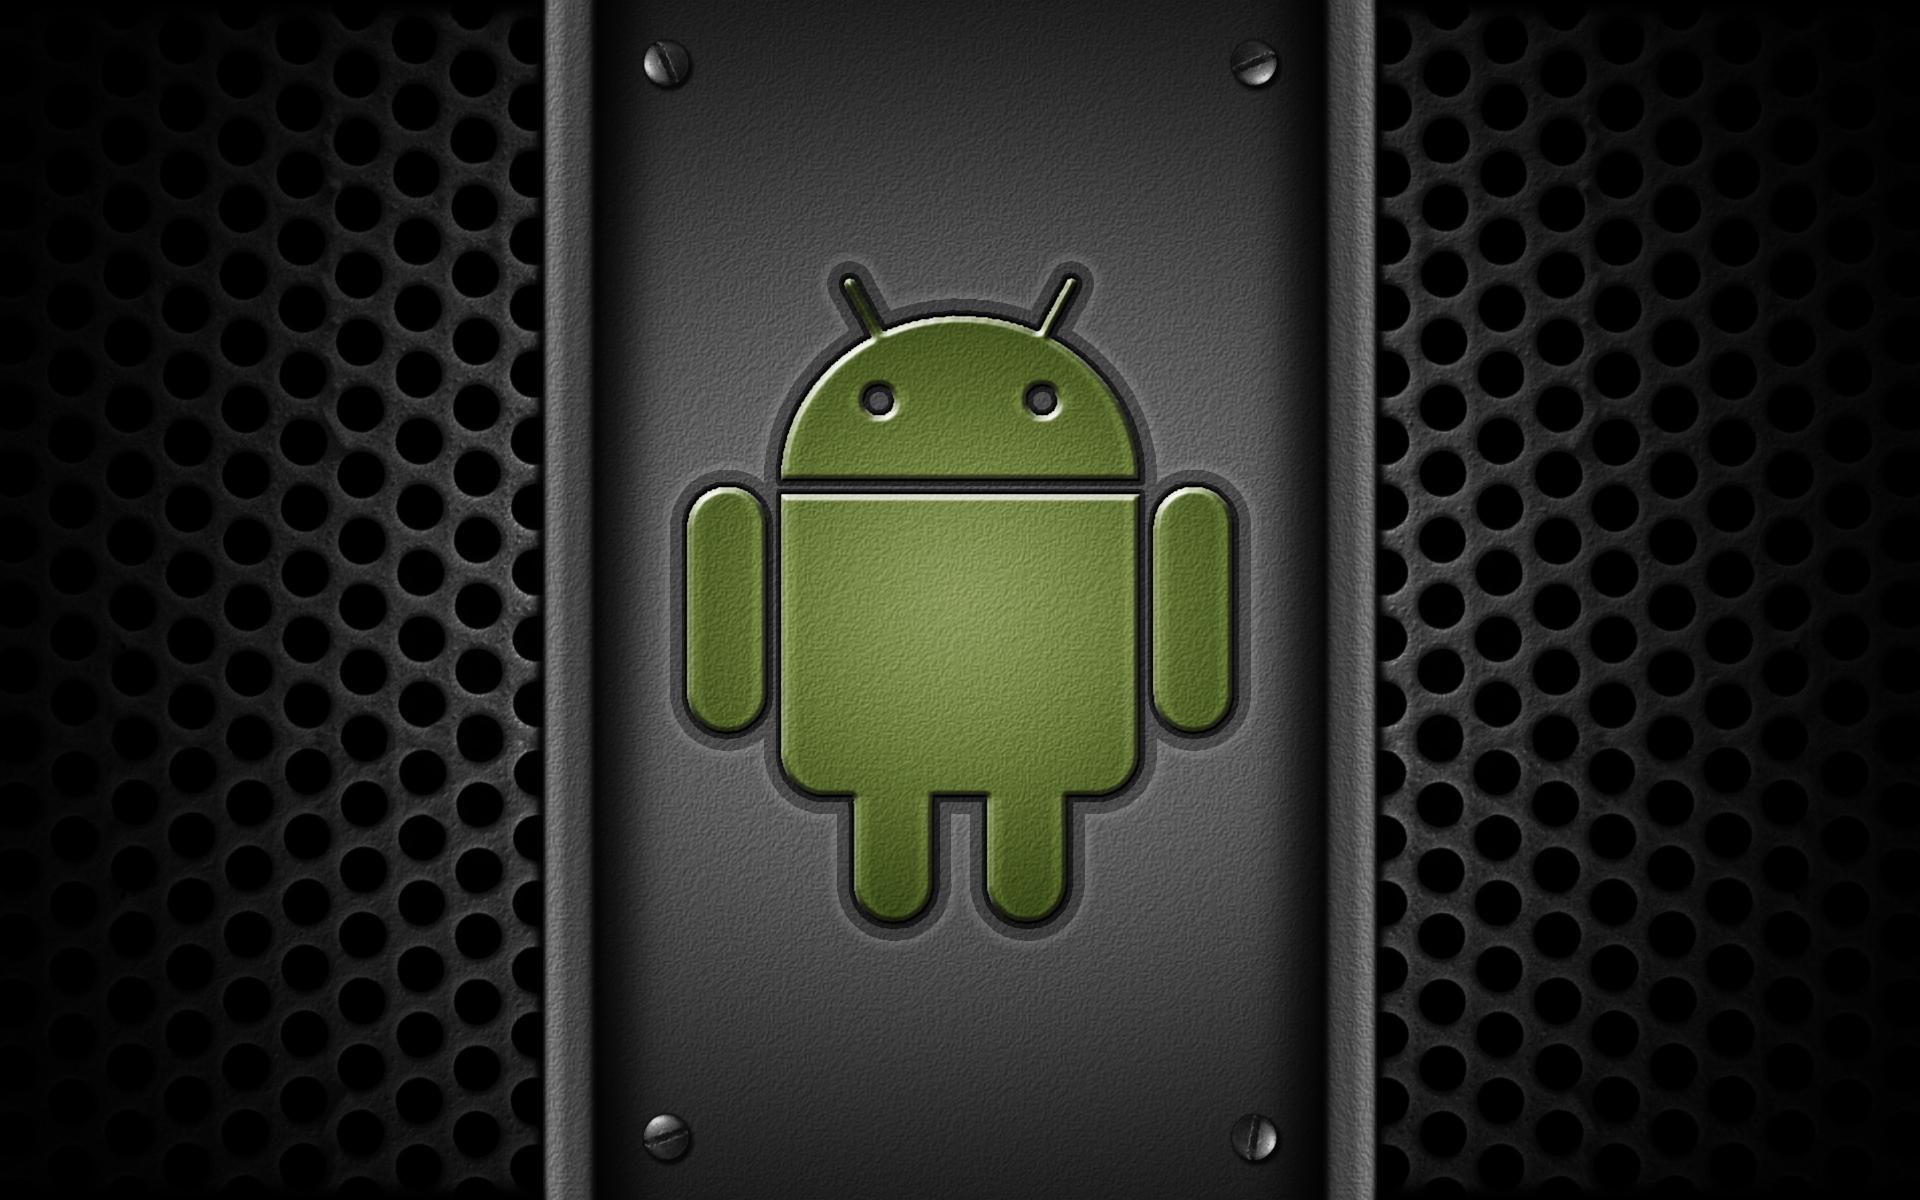 Android tablet wallpaper sf wallpaper collection of android background wallpaper on hdwallpapers voltagebd Images